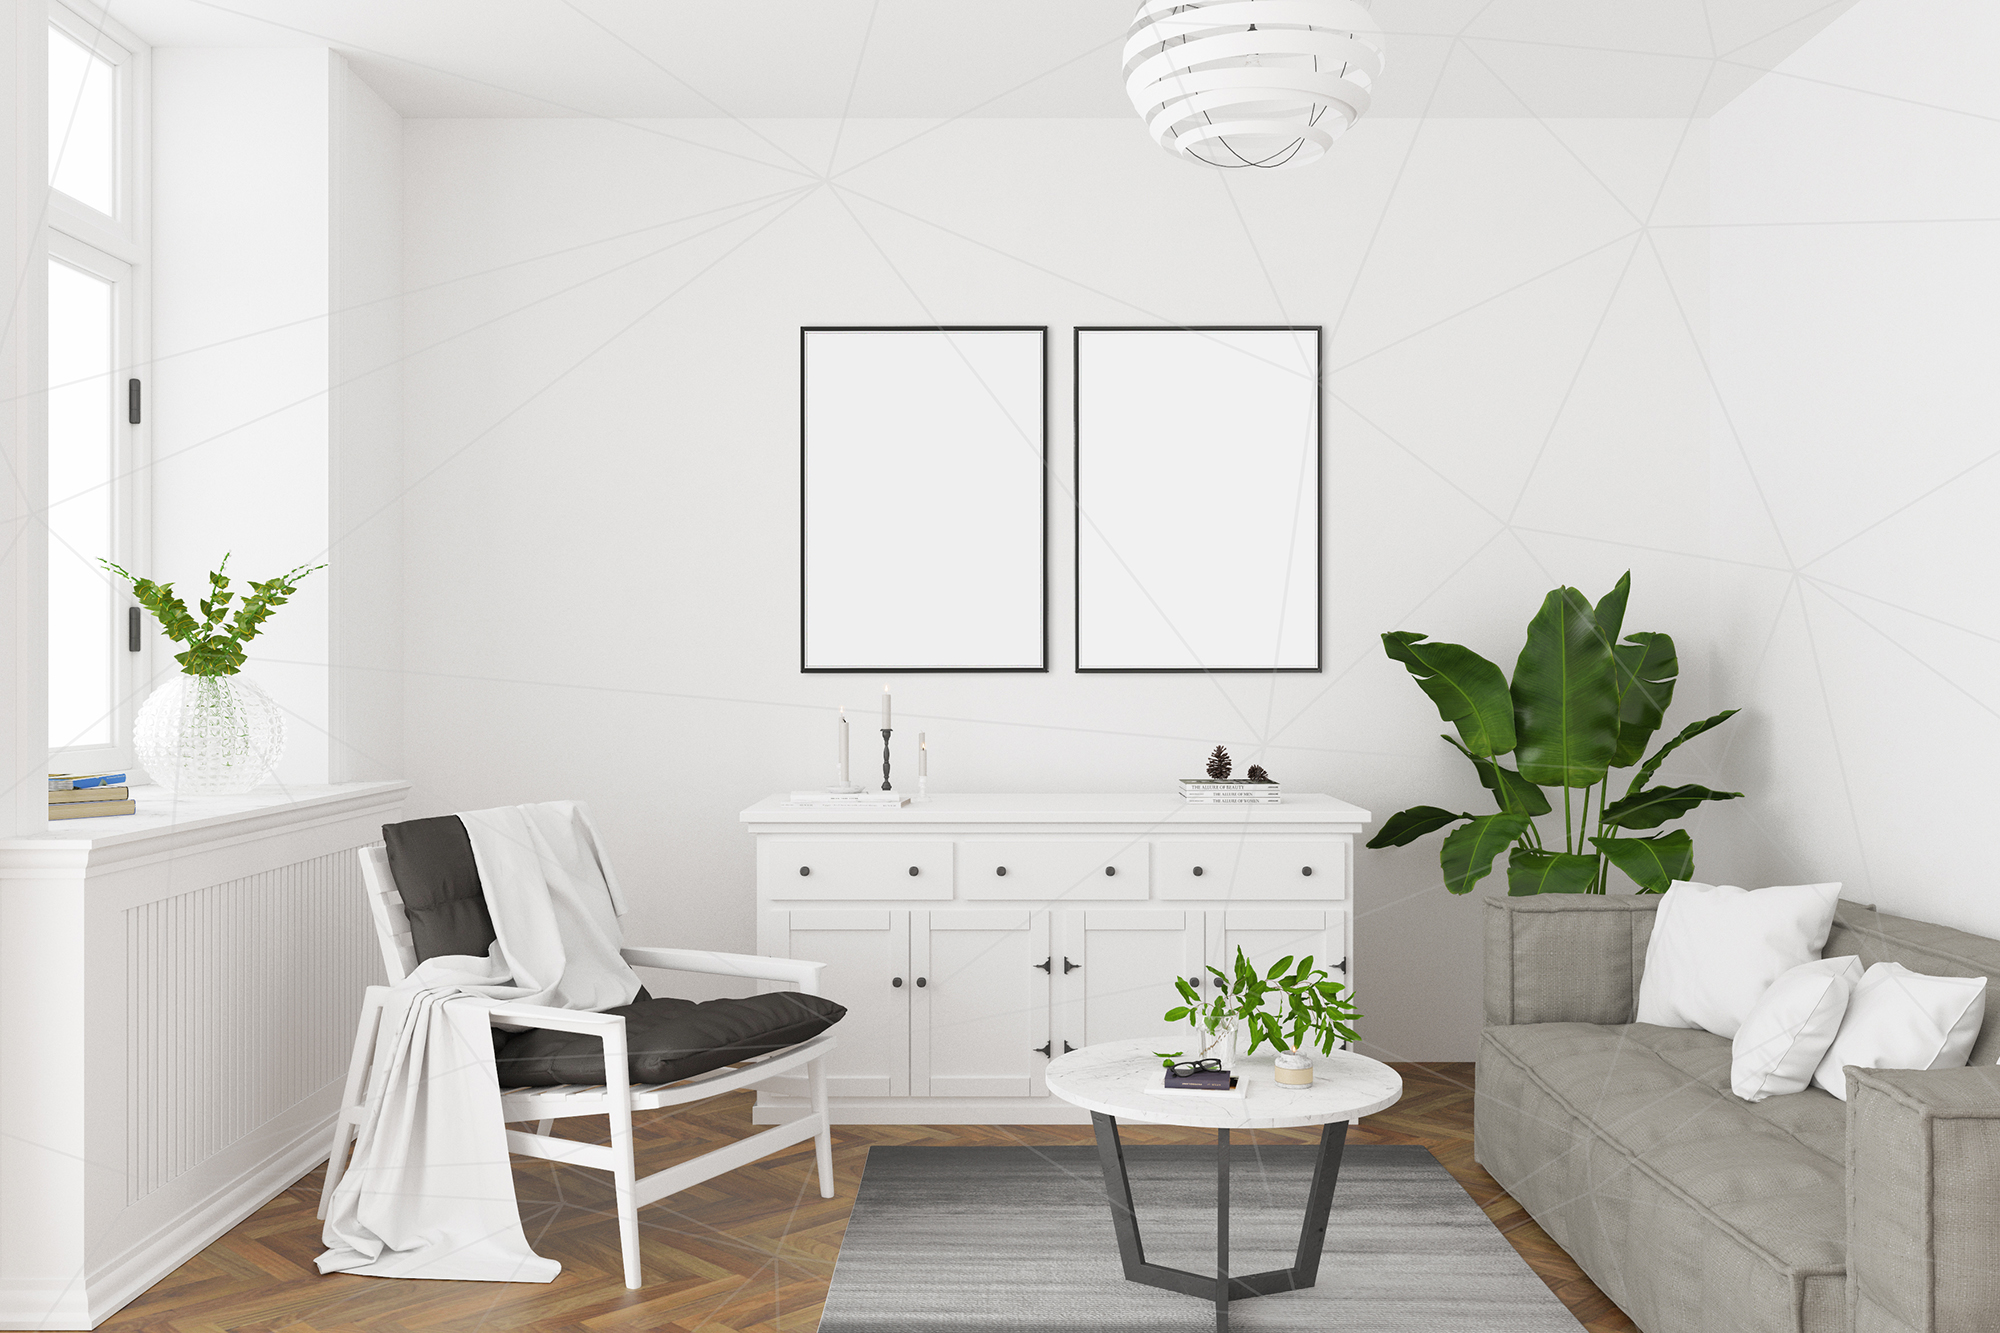 Interior mockup - artwork background example image 2